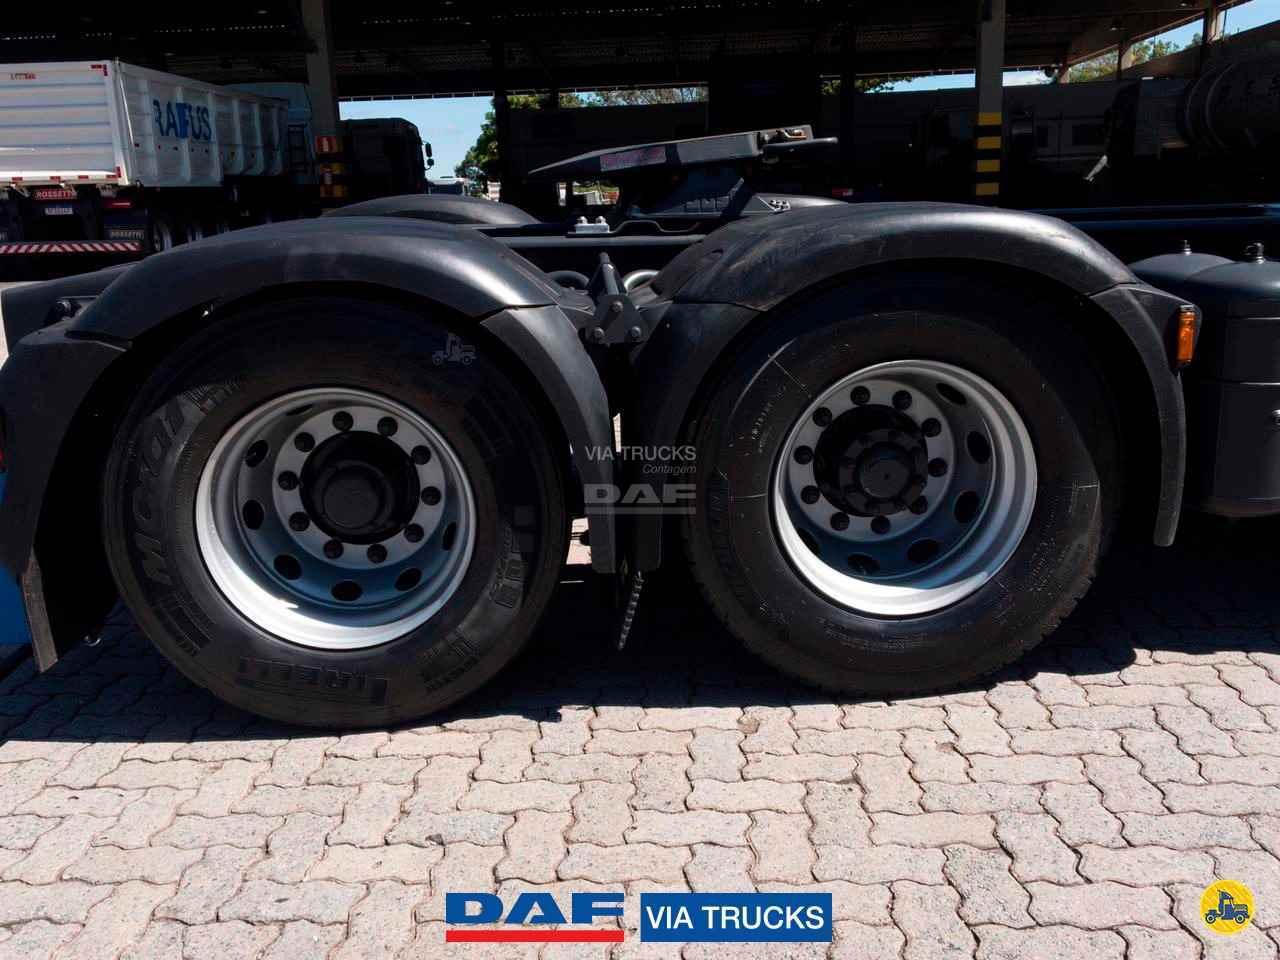 DAF DAF XF105 460 459188km 2015/2015 Via Trucks - DAF